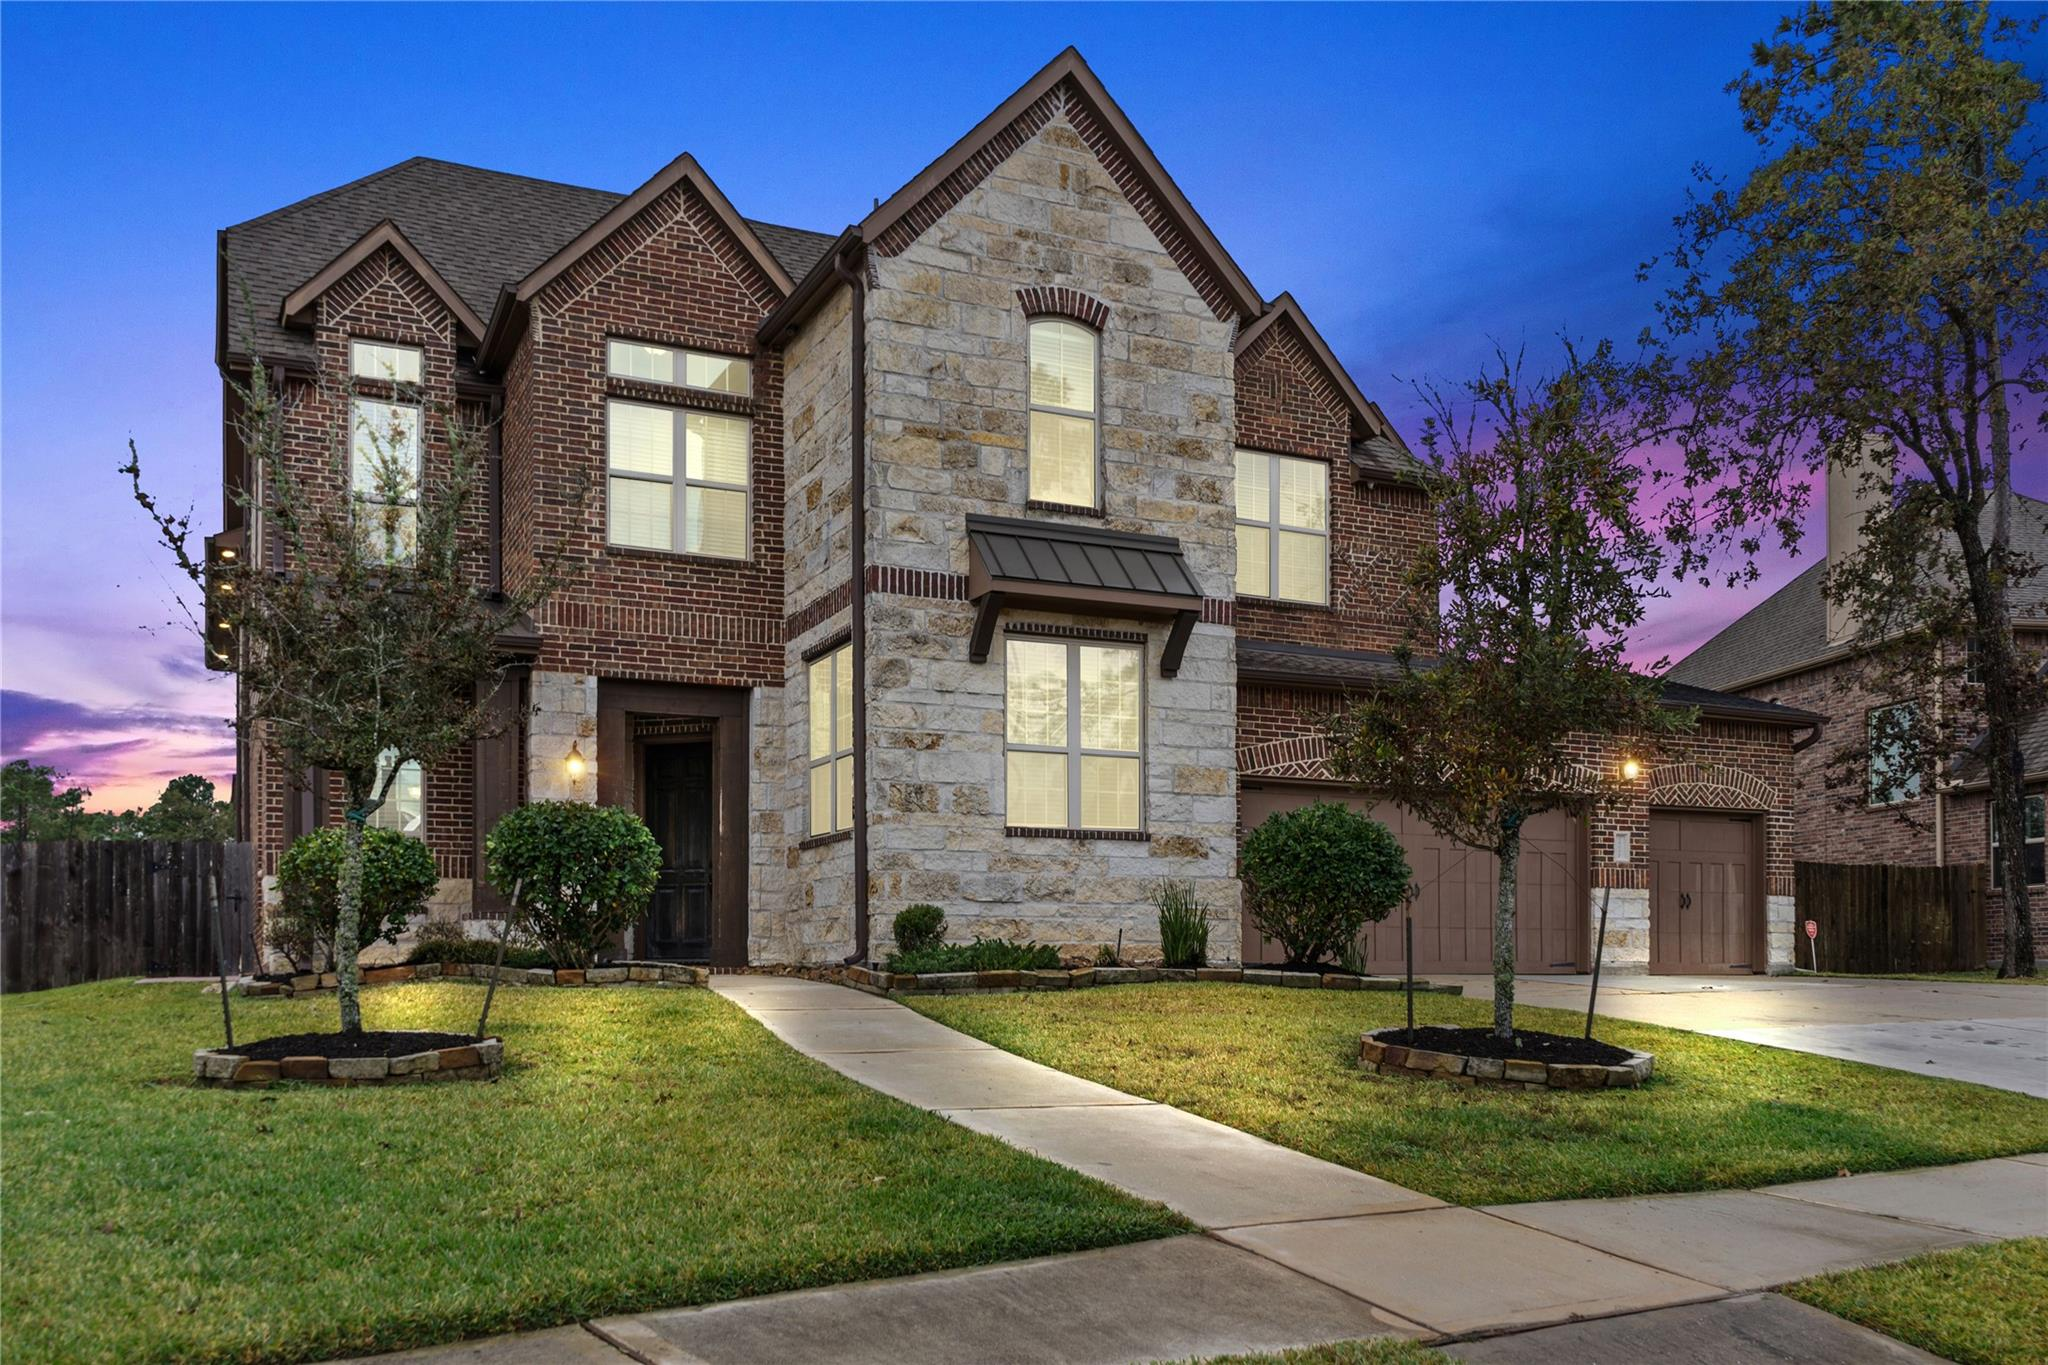 18007 Stari Most Lane Property Photo - Houston, TX real estate listing